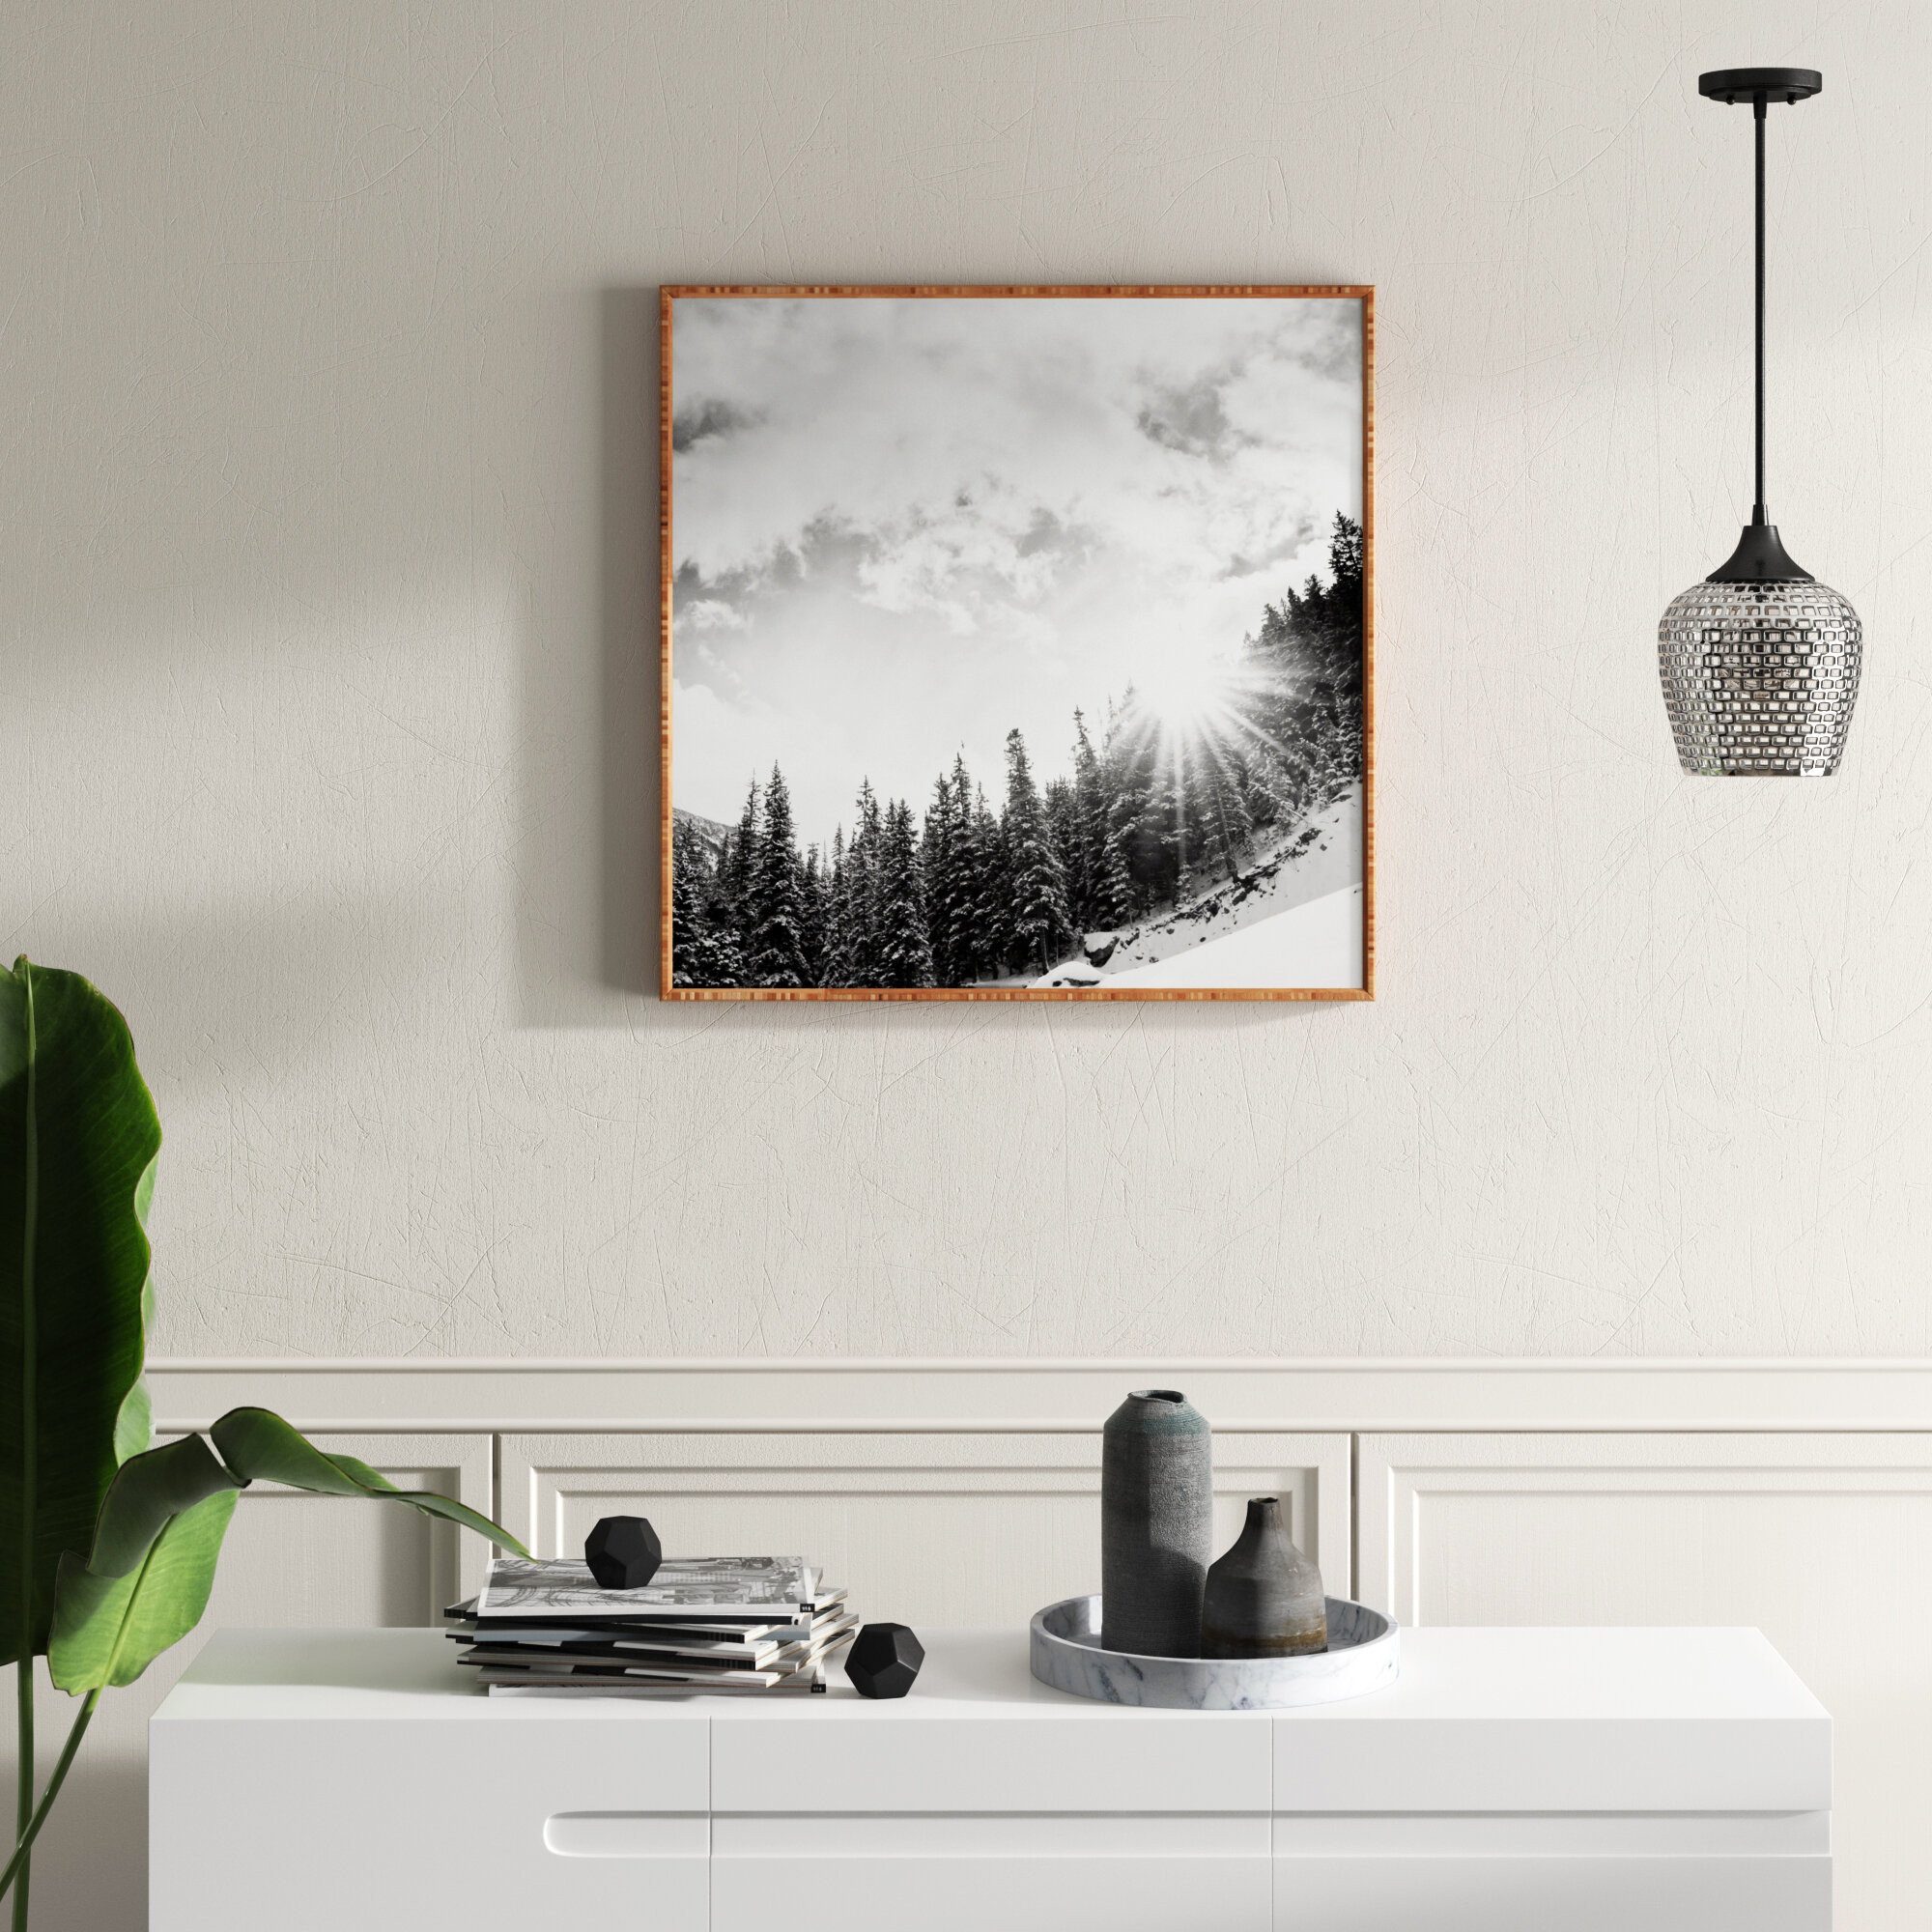 Mercury Row Mountain Picture Frame Photograph Print On Wood Reviews Wayfair